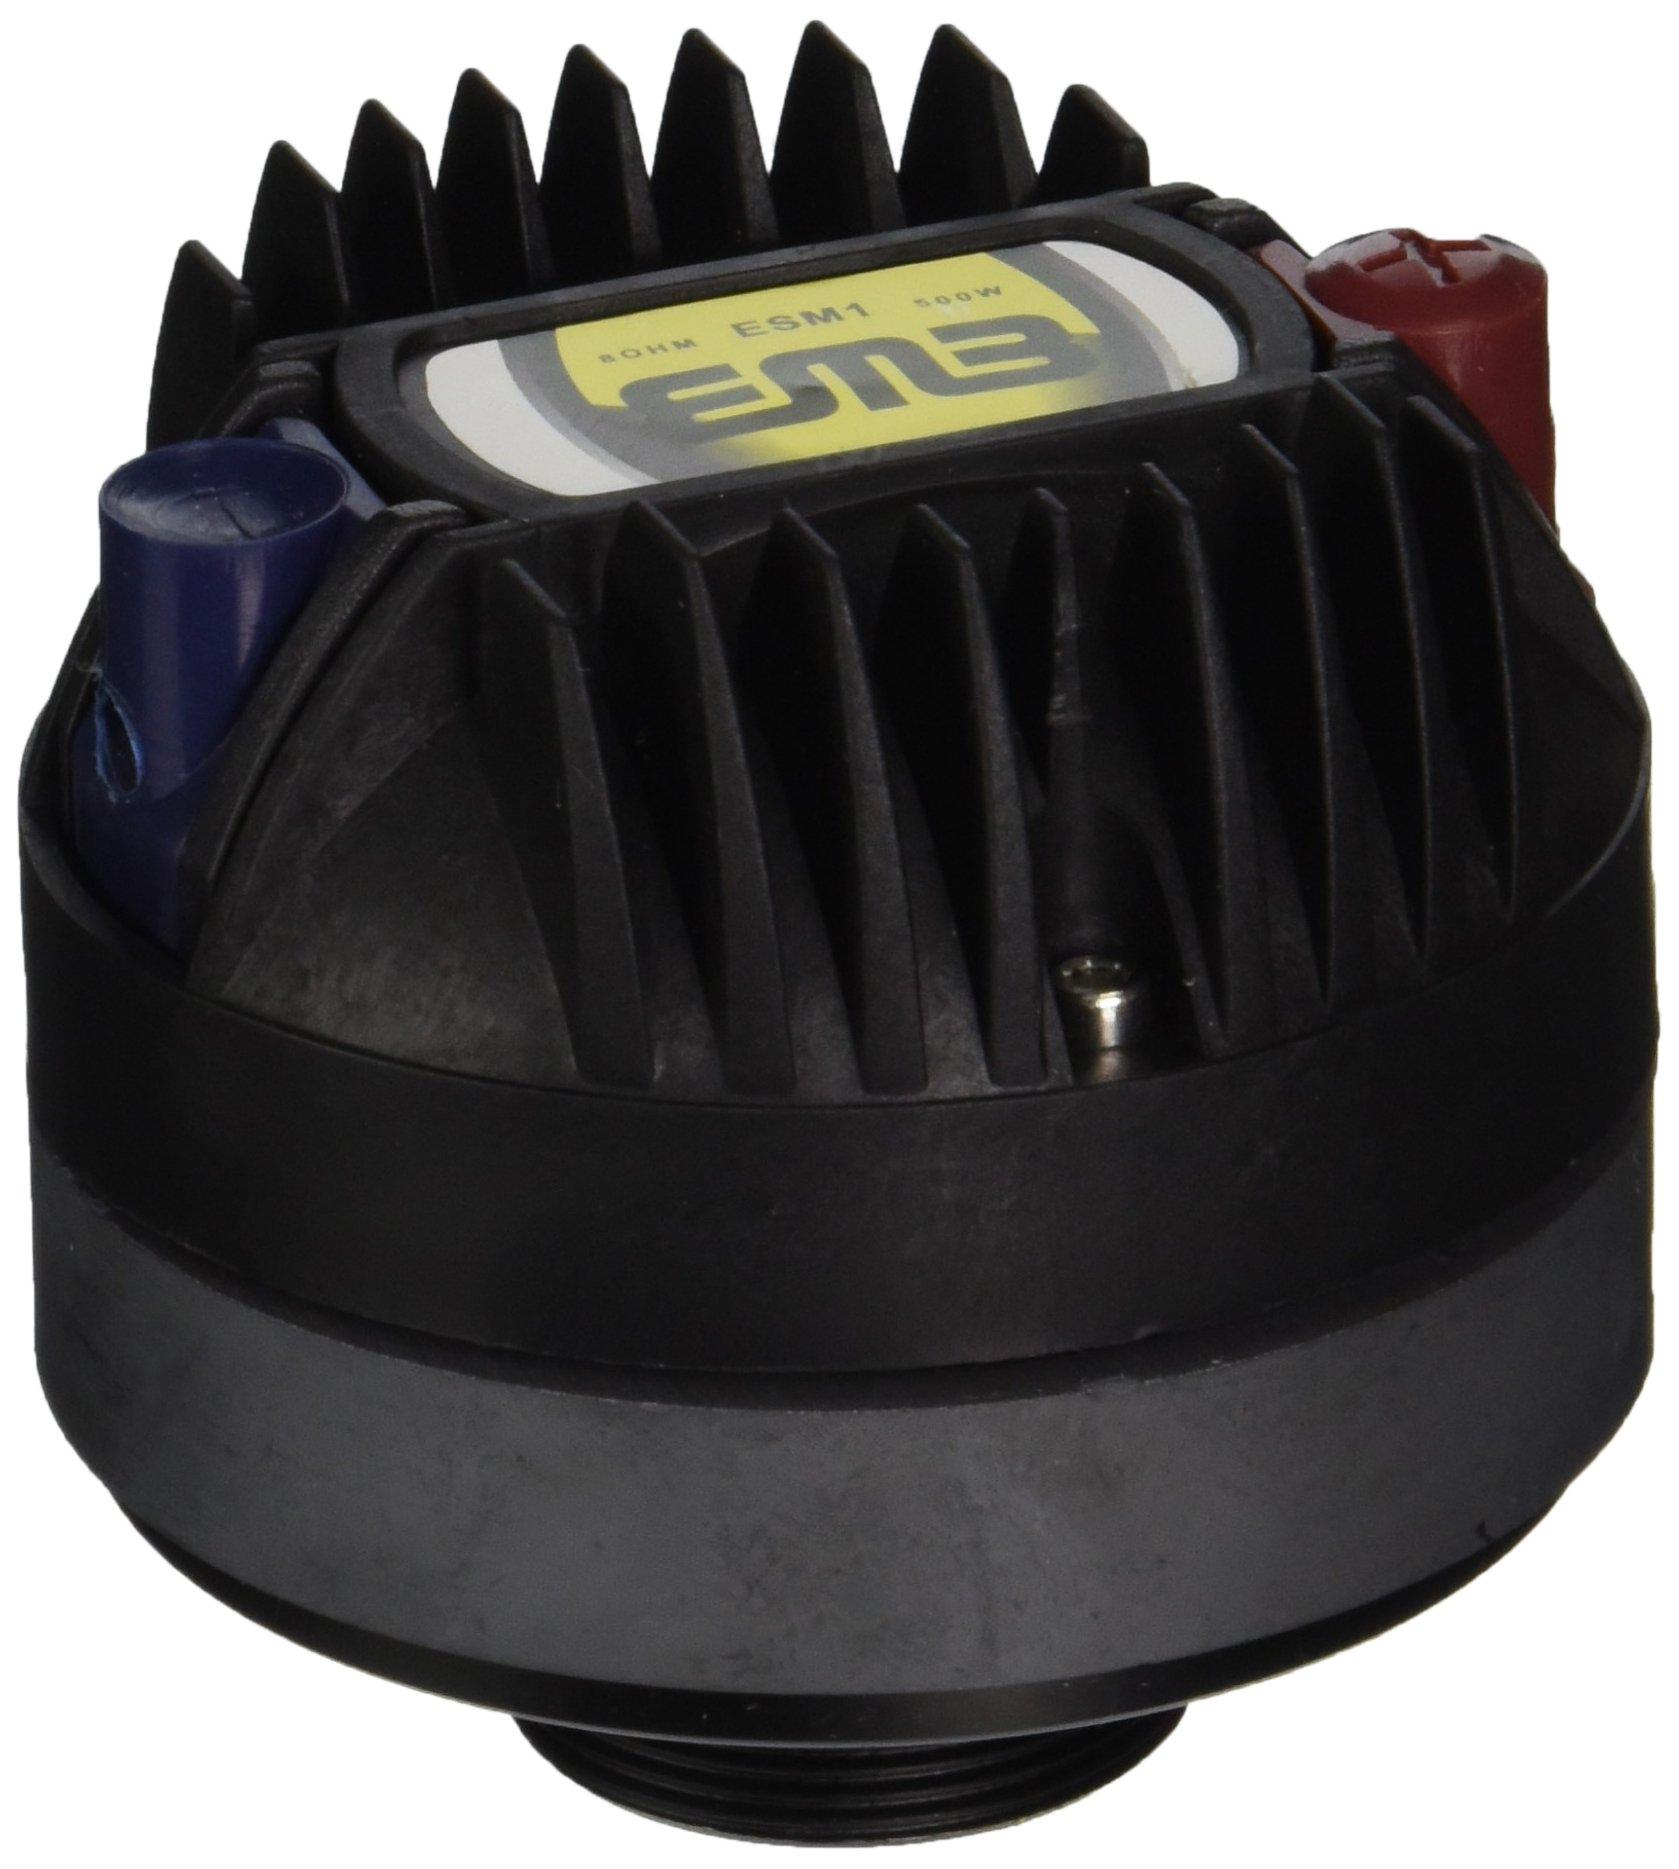 EMB ESM1 400W Max Power Compression Tweeter WORKS FOR JBL, Peavey, Cerwin Vega, Gemini, etc